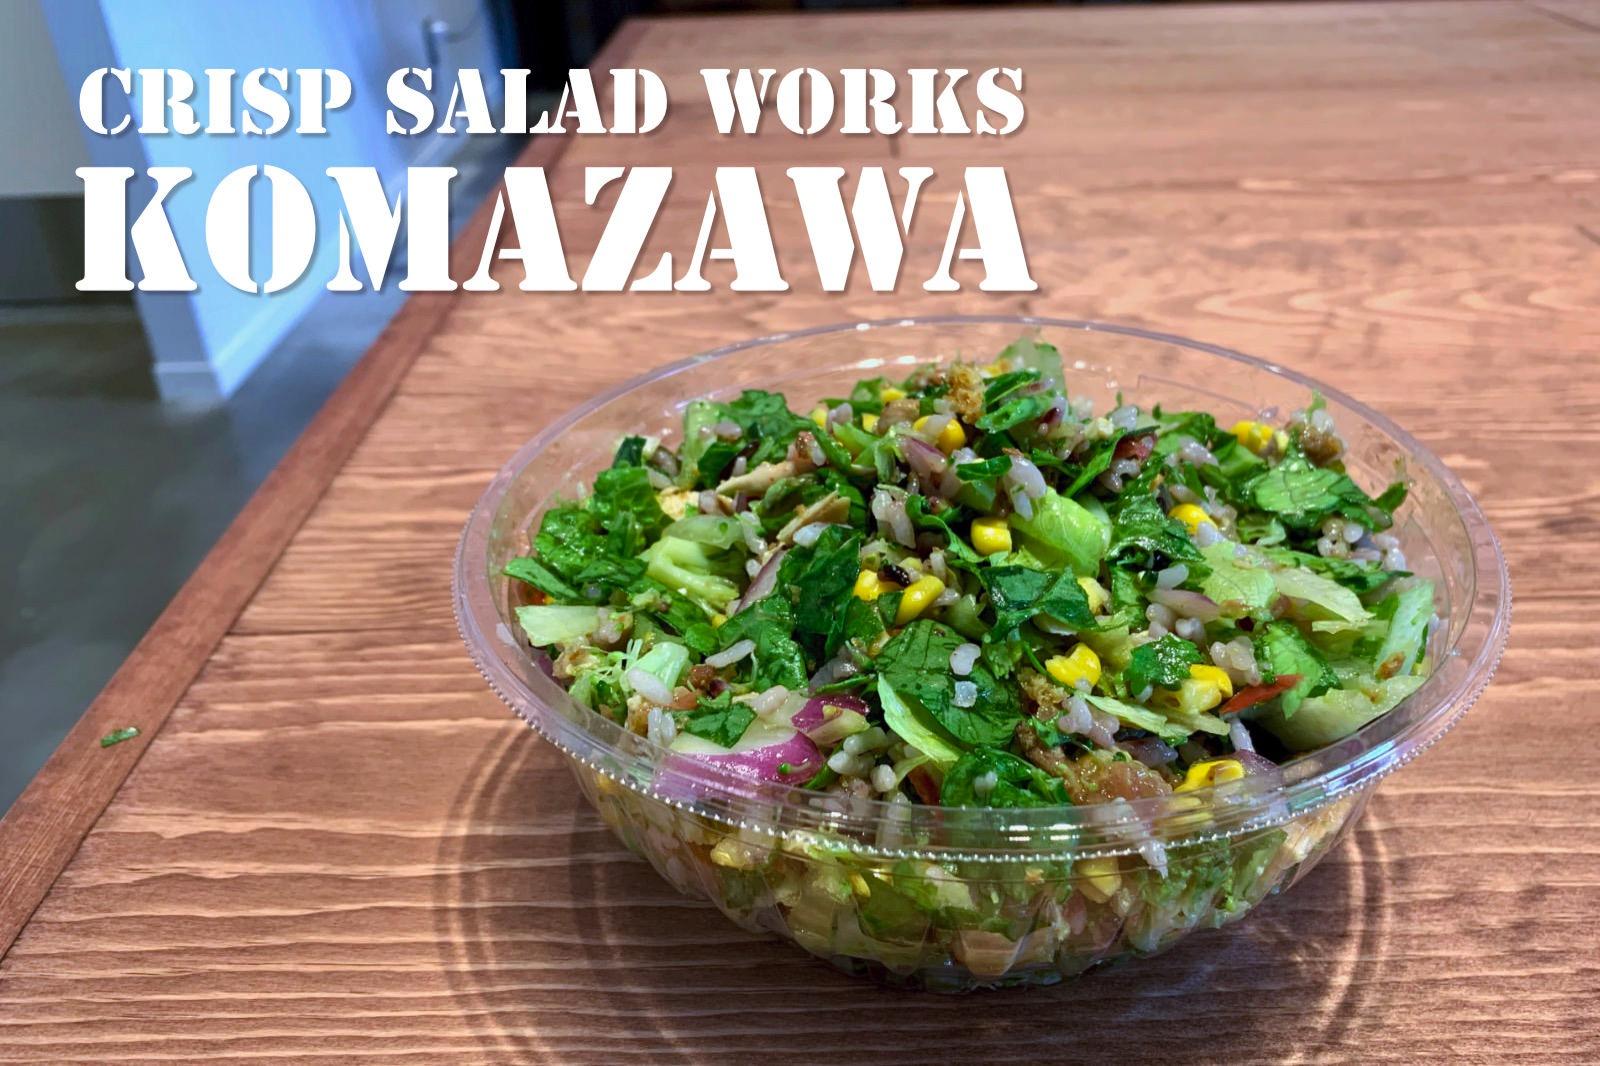 Crisp-Salad-Works-Komazawa.jpg